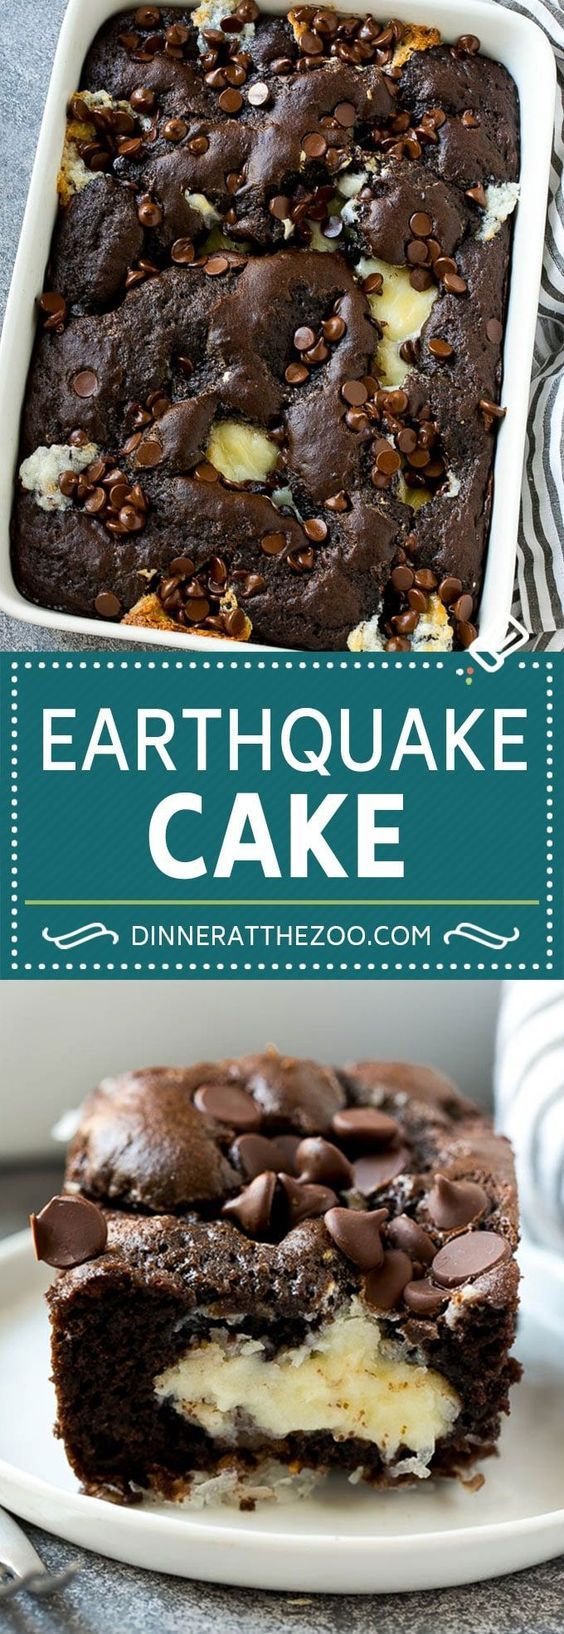 Earthquake Cake Recipe | Chocolate Cake Recipe | Chocolate Coconut Cake | Coconut Pecan Cake